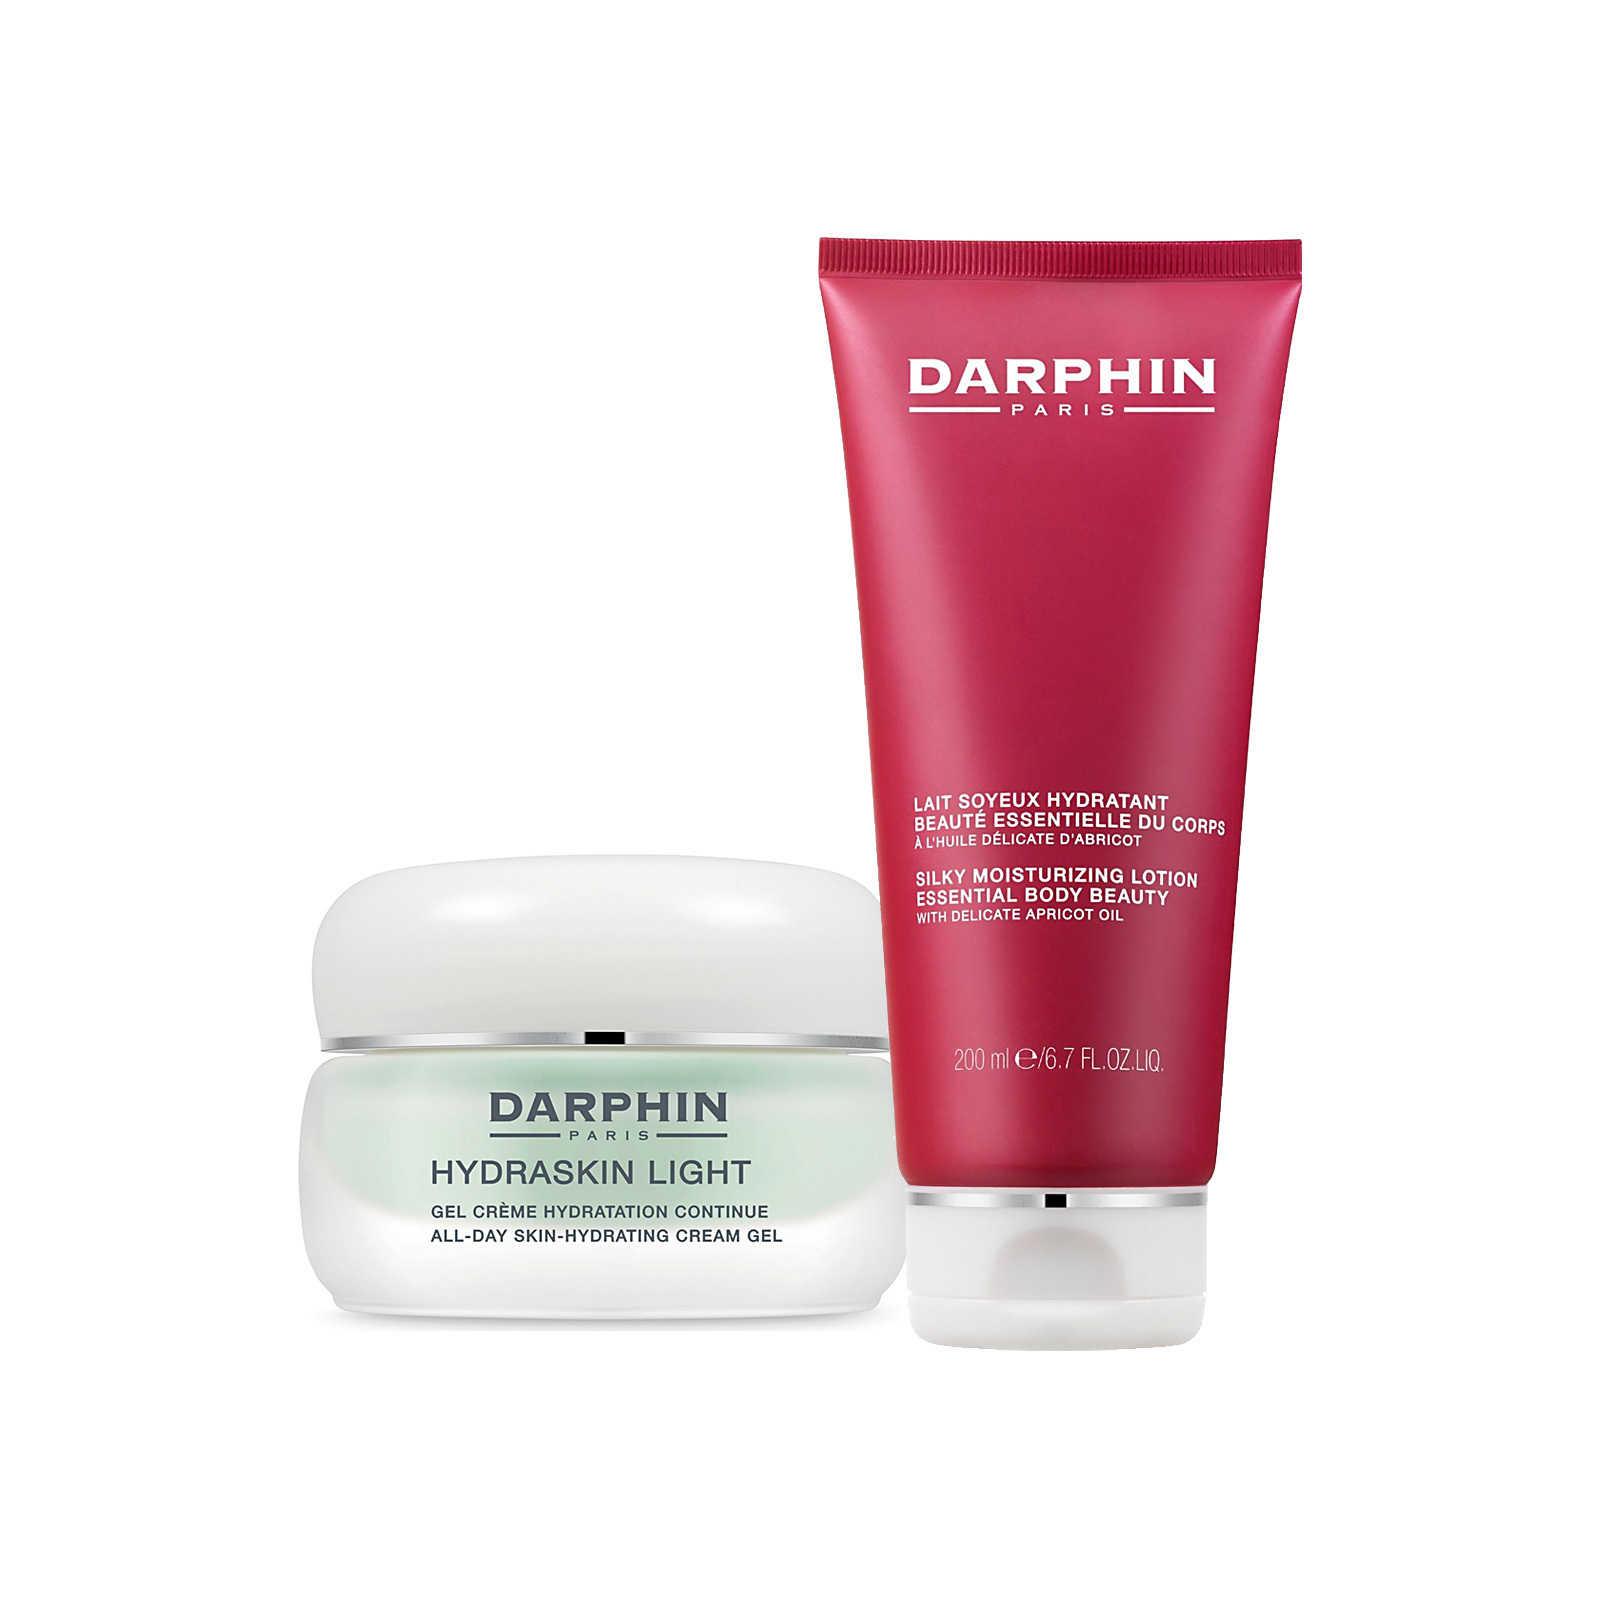 Darphin - Beauty Secret - Crema Idratante al 100%